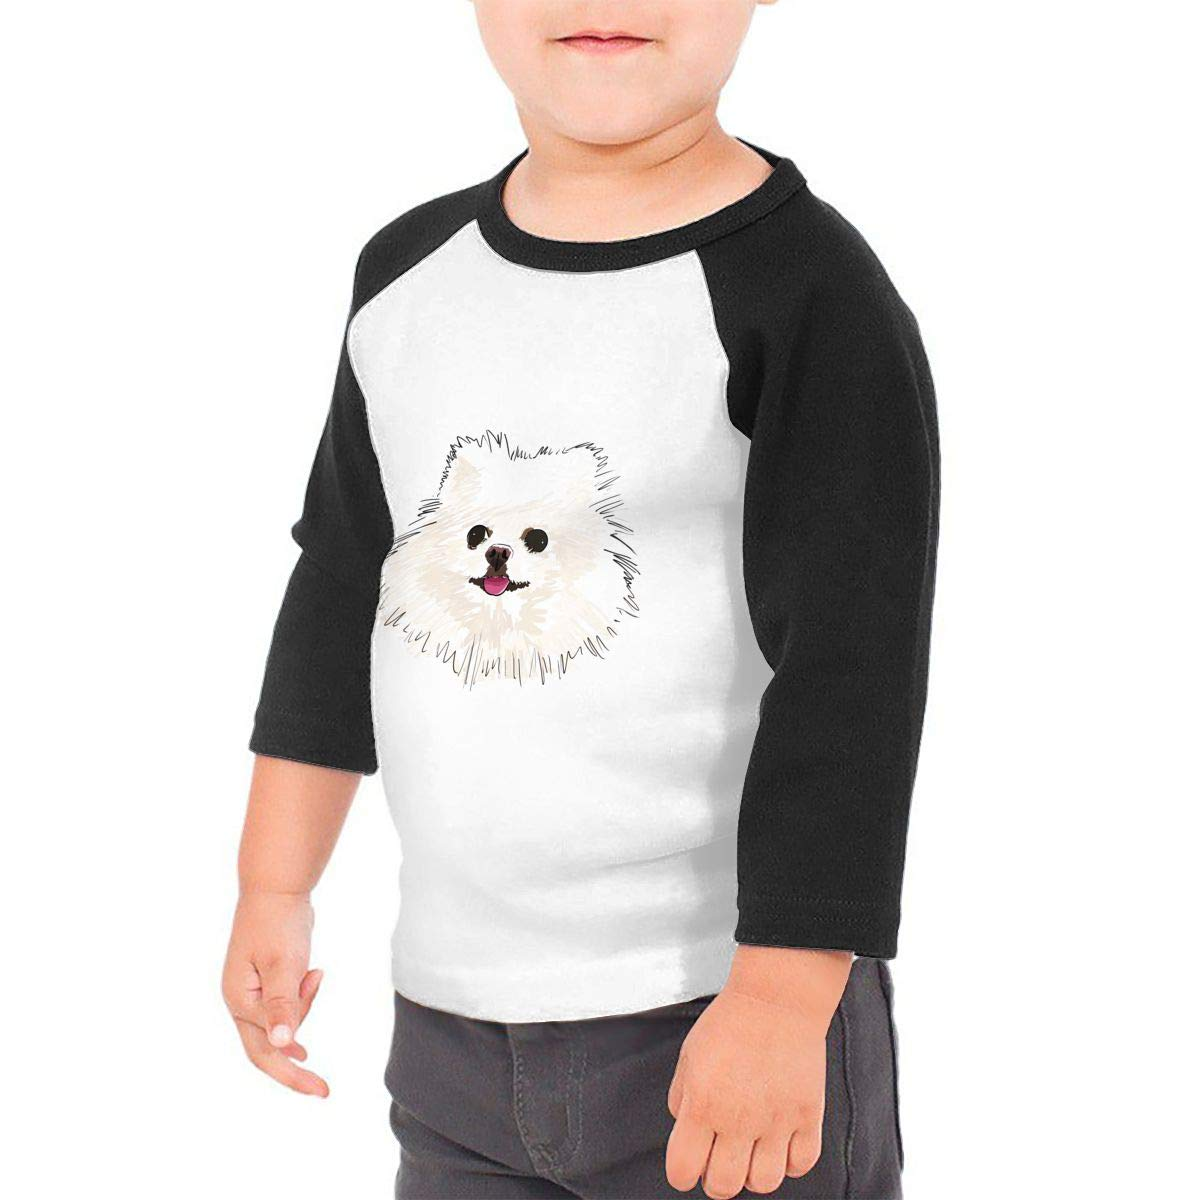 Kocvbng I White Pomeranian Painting Raglan 3//4 Sleeve Shirt for Girls Boy